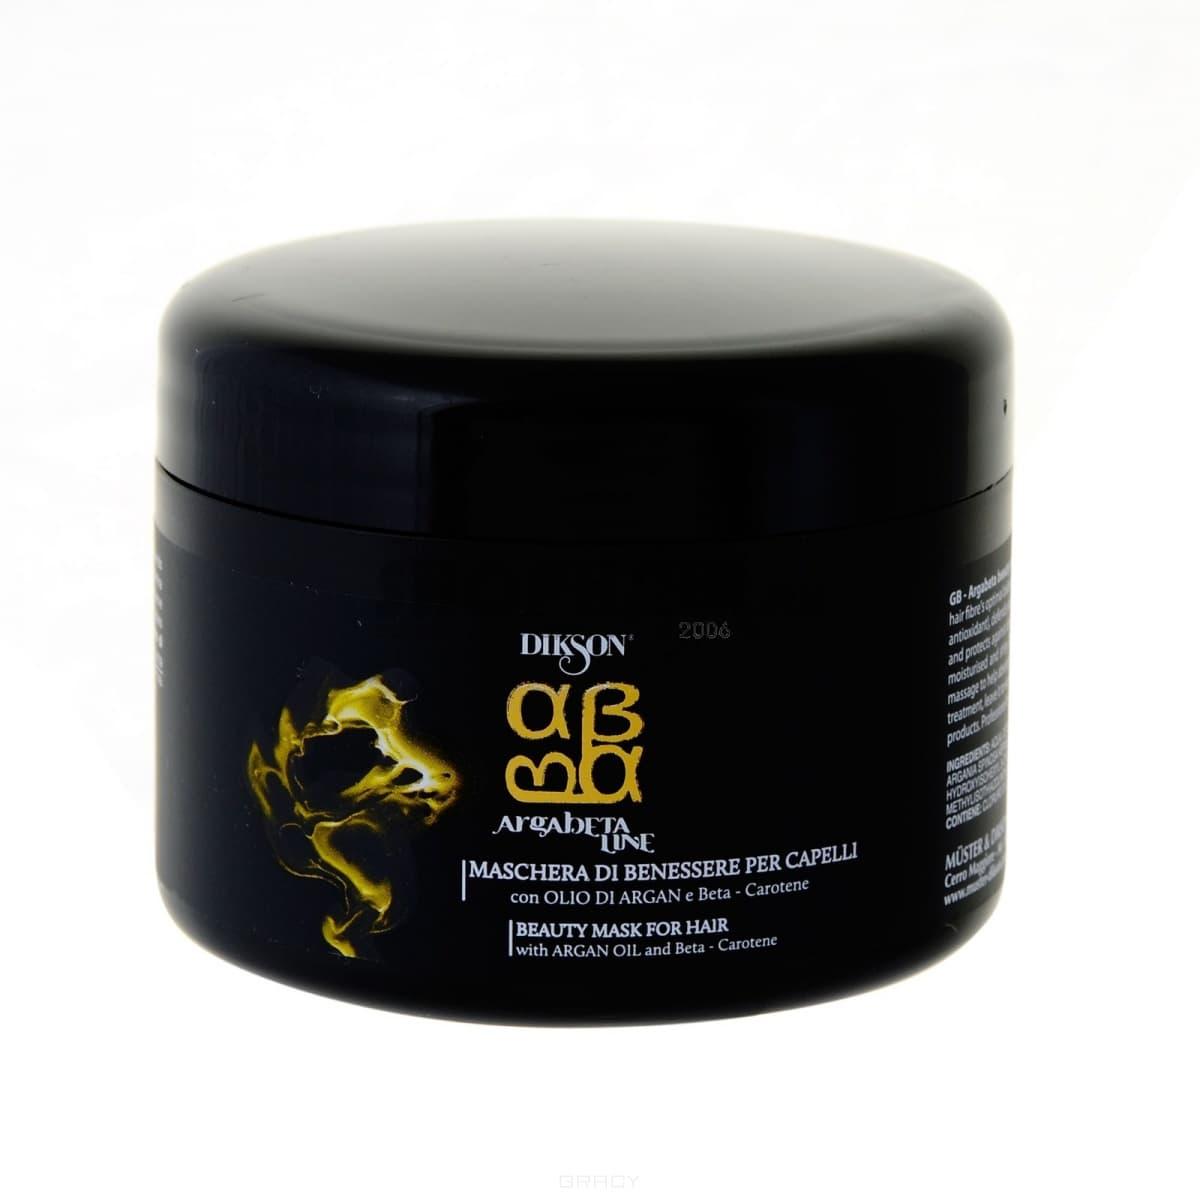 Dikson Маска для волос восстанавливающая, питательная на основе масла Аргана с Beta-Carotene ArgaBeta Beauty Mask, 250 мл dikson масло для ухода за всеми типами волос с бета каротином и маслом аргана dikson argabeta oil 2420 30 мл